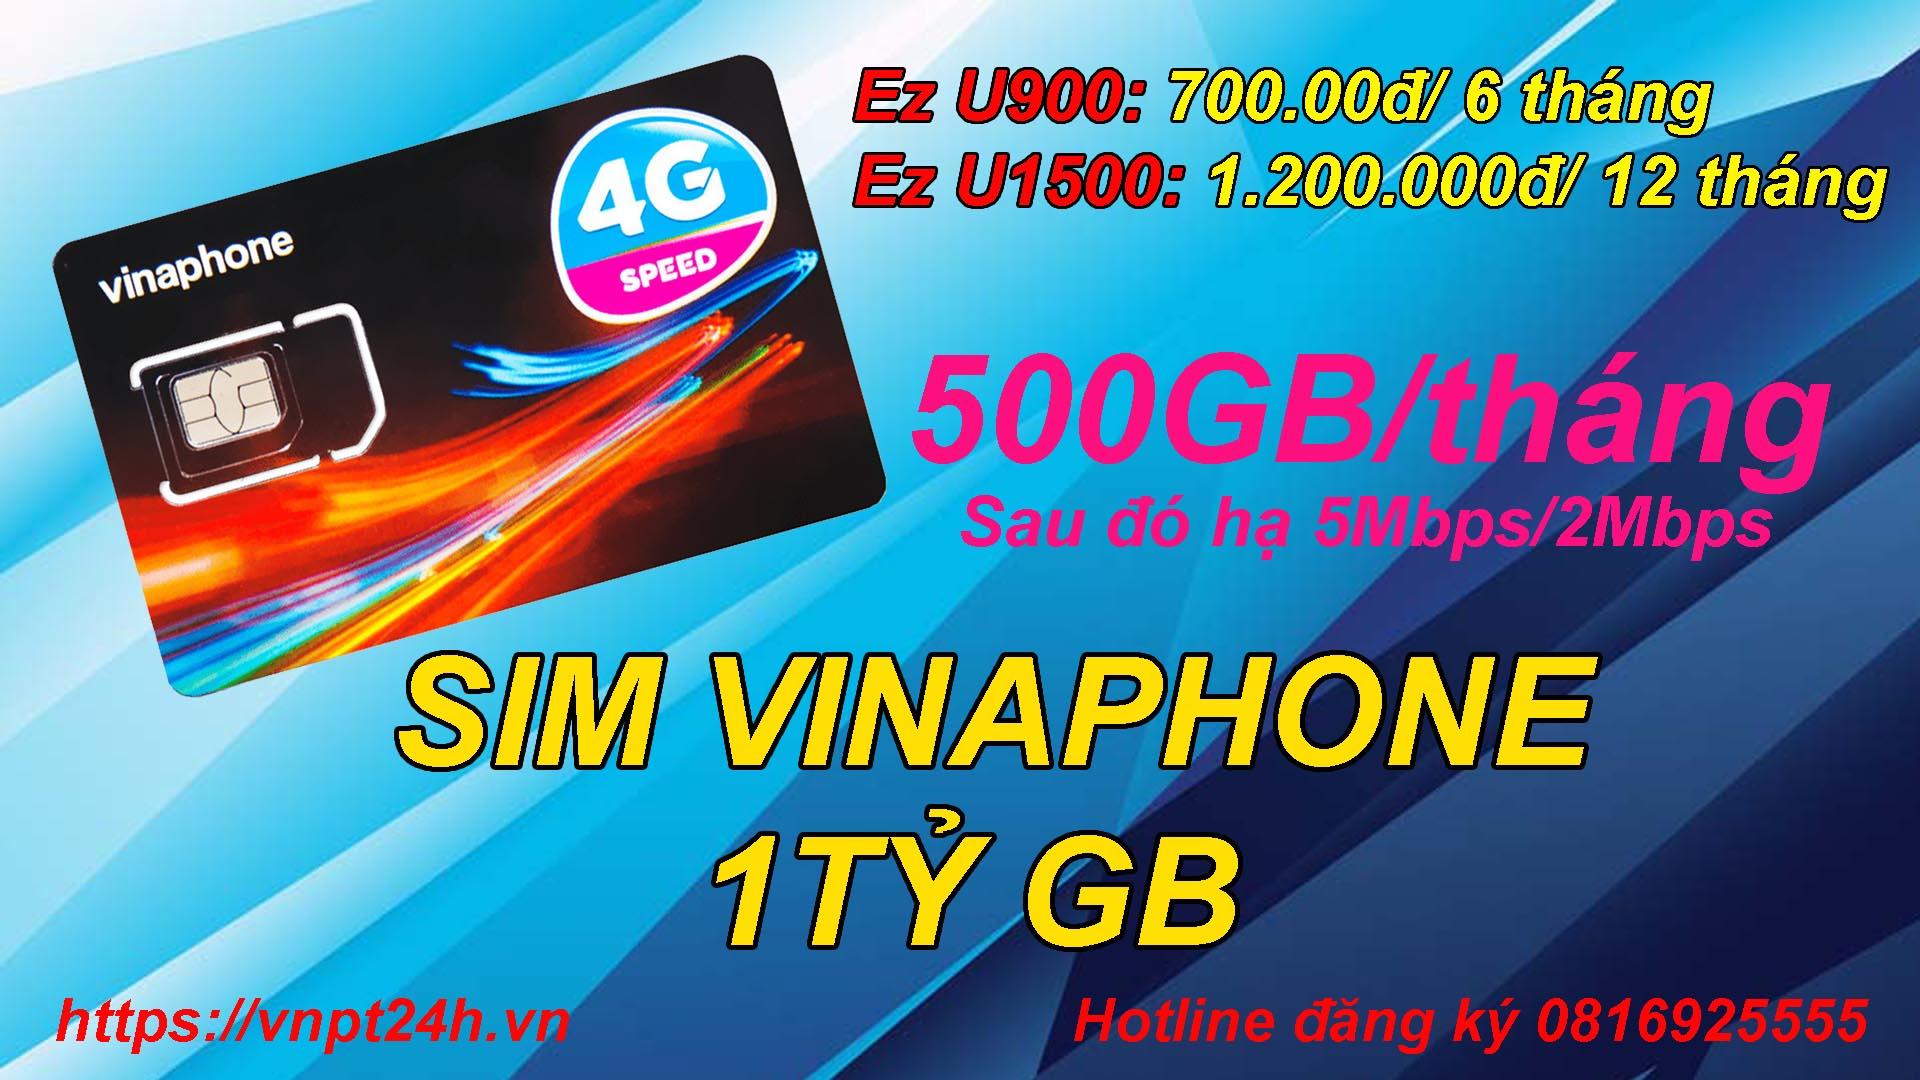 Sim vinaphone 1 tỷ GB